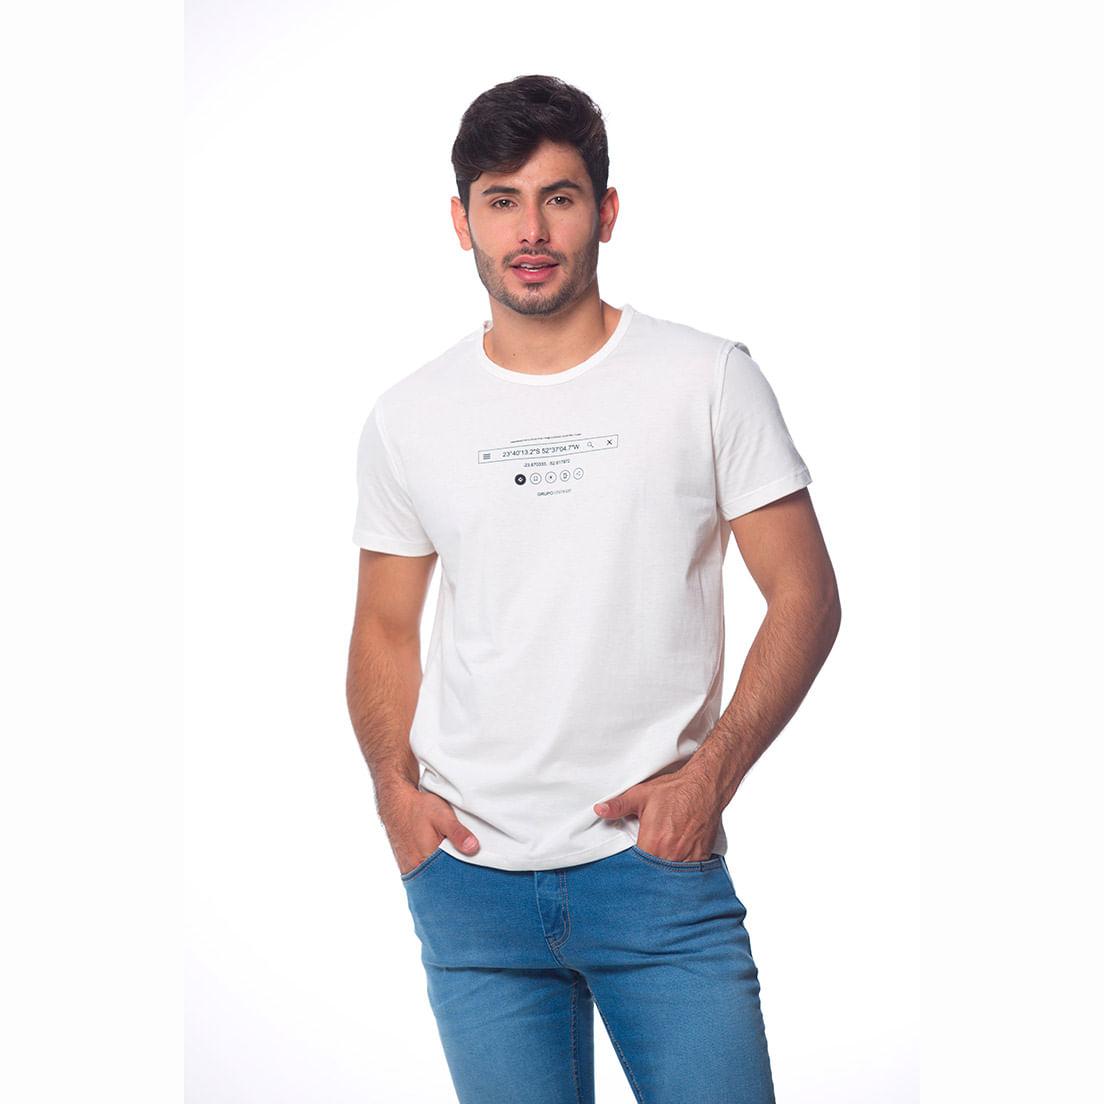 Camiseta Osmoze Sem Ribana 06 110112848 Branco